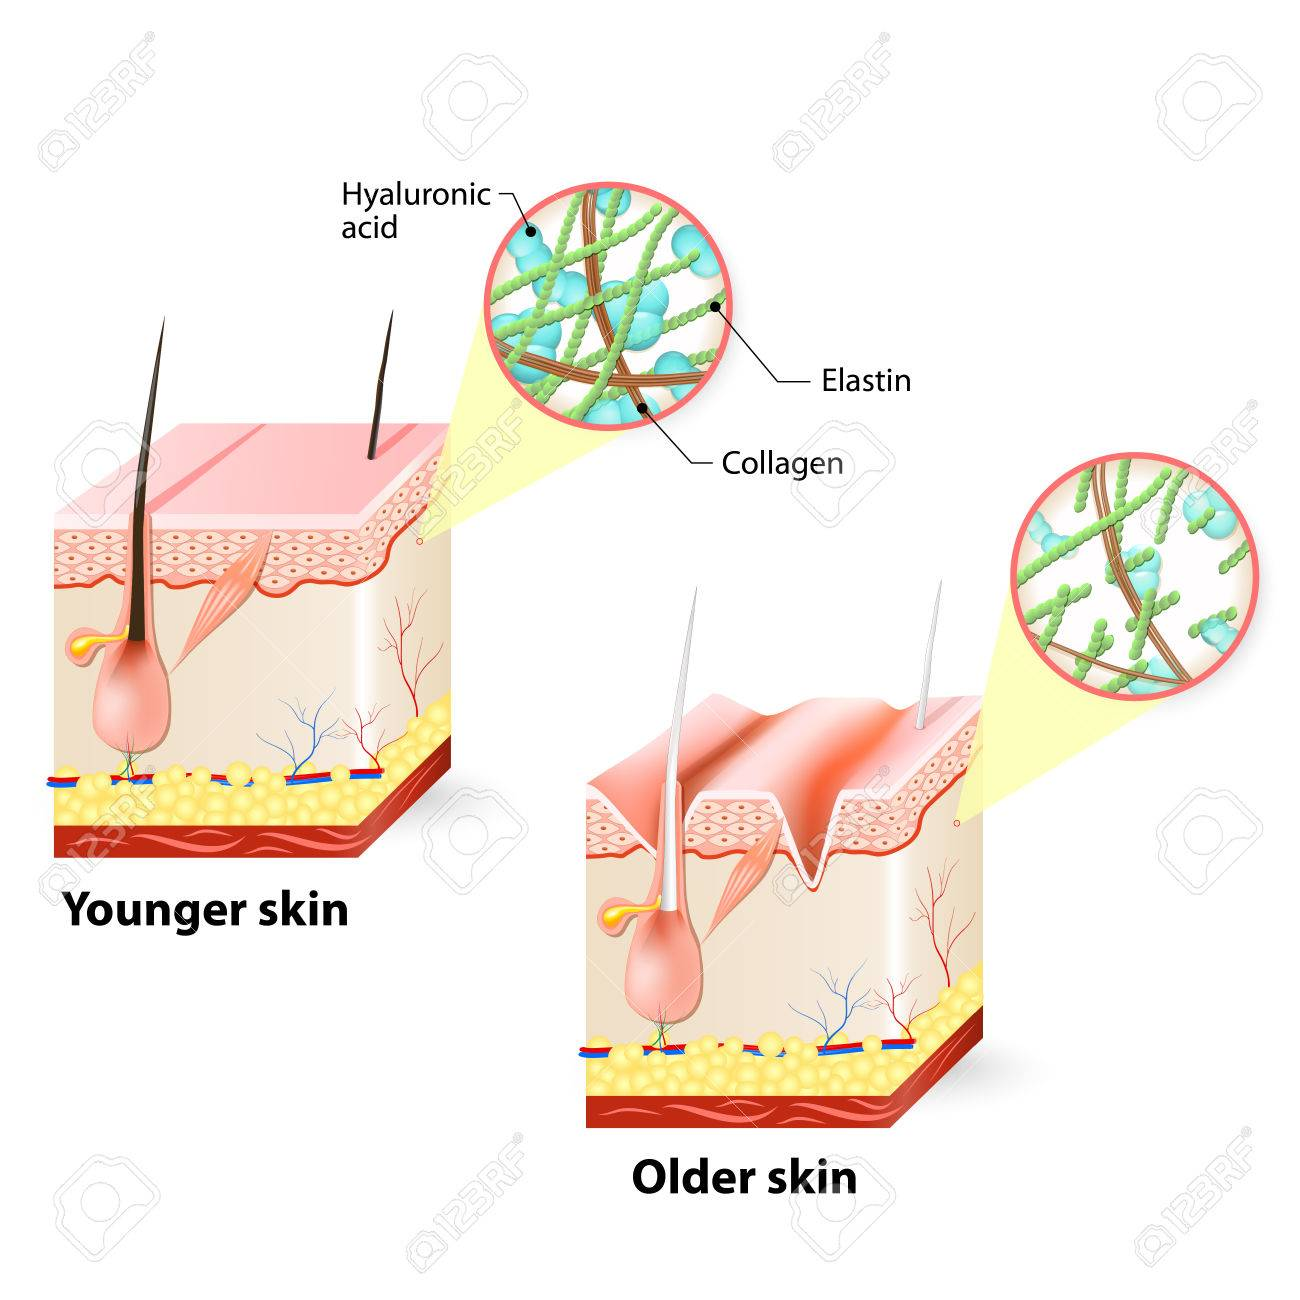 http://n3.datasn.io/data/api/v1/n3zm/image_of_skin_disease_5/by_table/skin_disease_image_download_access/db/17/45/ed/db1745edde8b837fff38ef1e0a02e40e3f604a3a.jpg